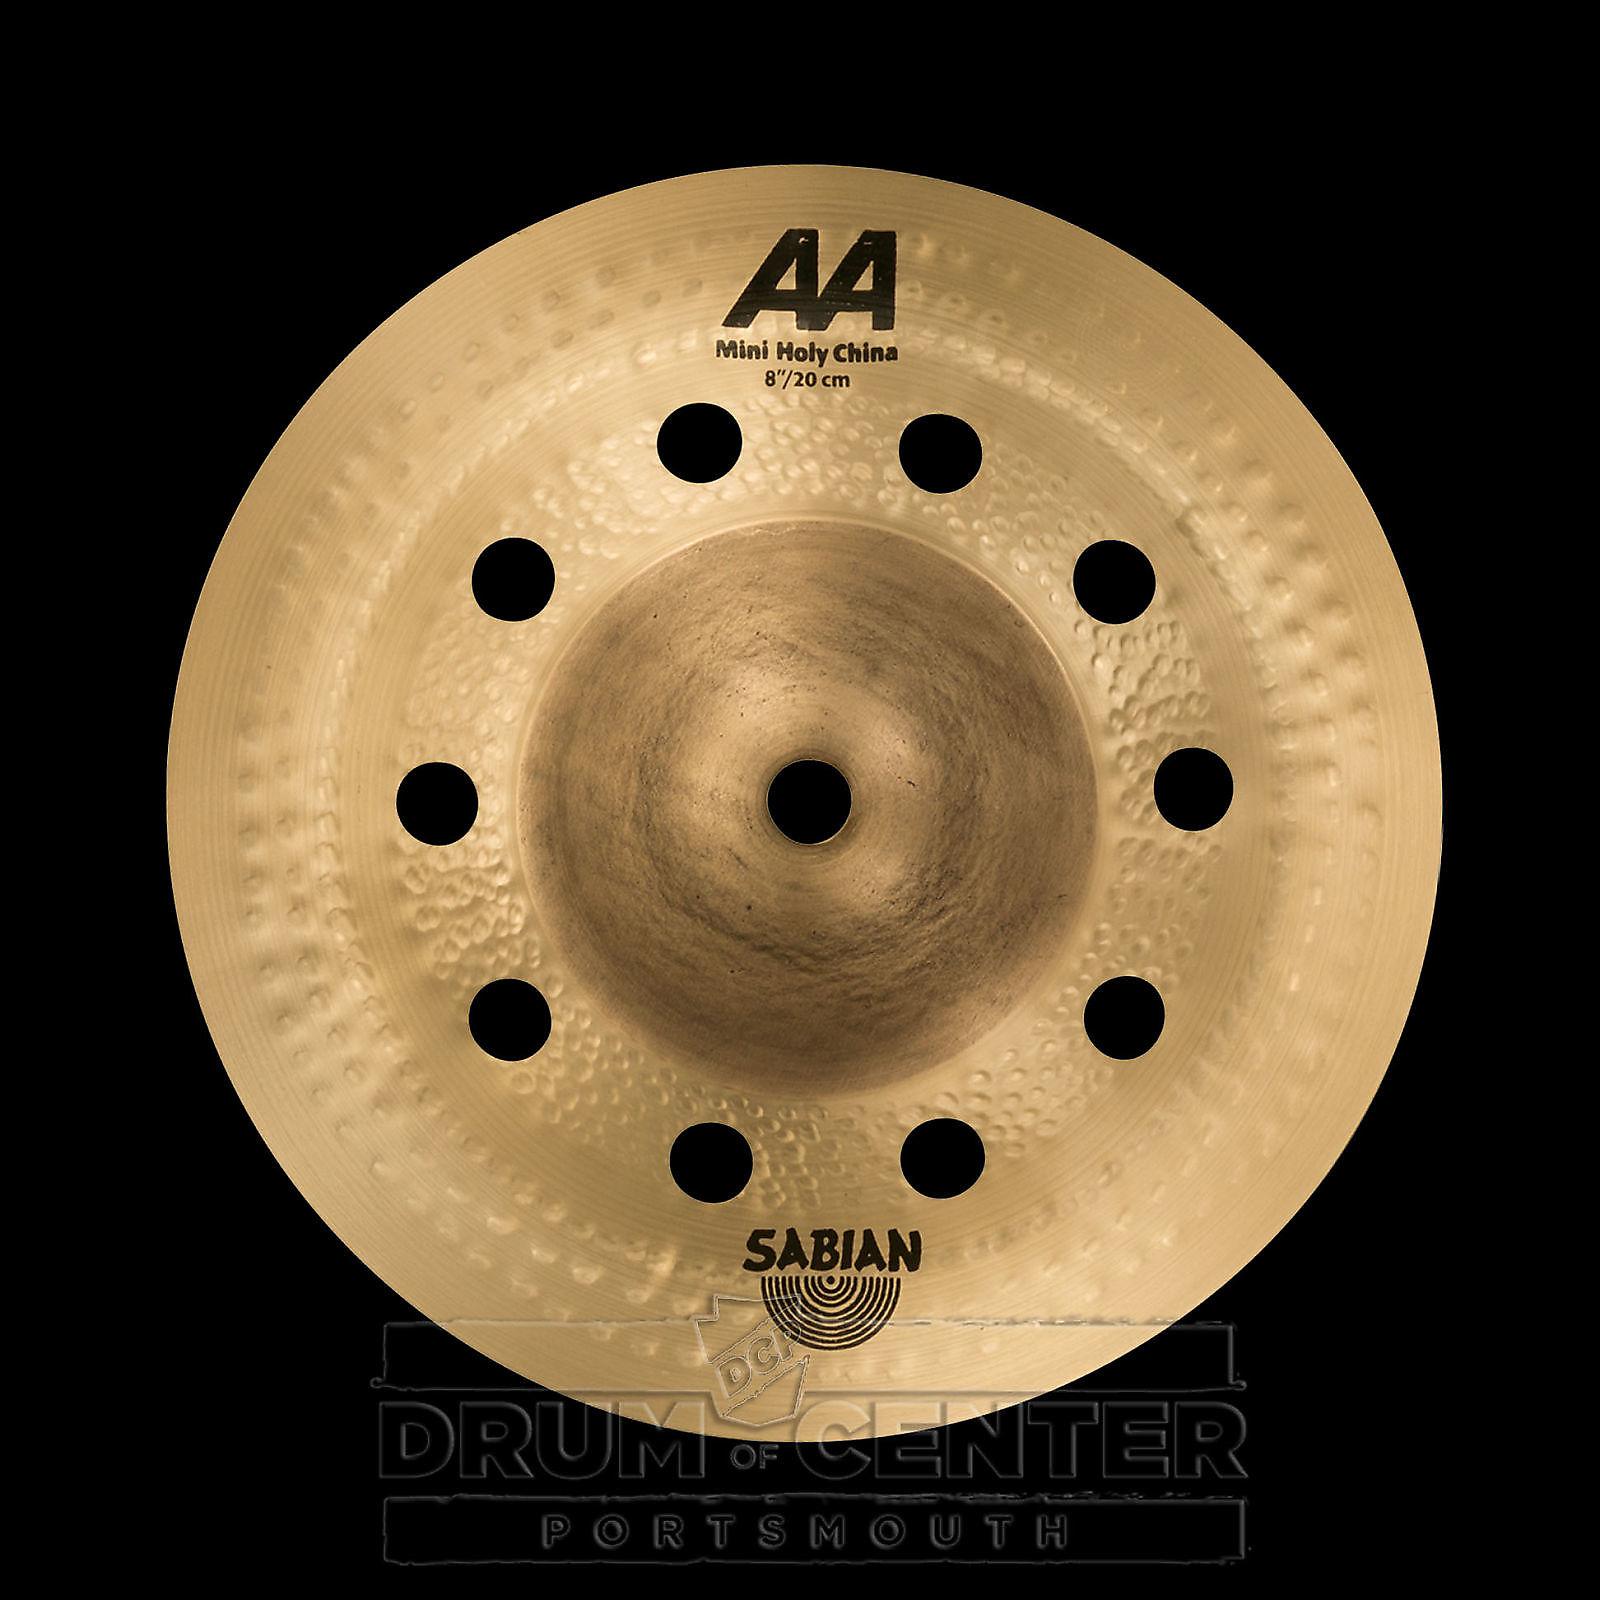 sabian 8 aa mini holy china cymbal reverb. Black Bedroom Furniture Sets. Home Design Ideas